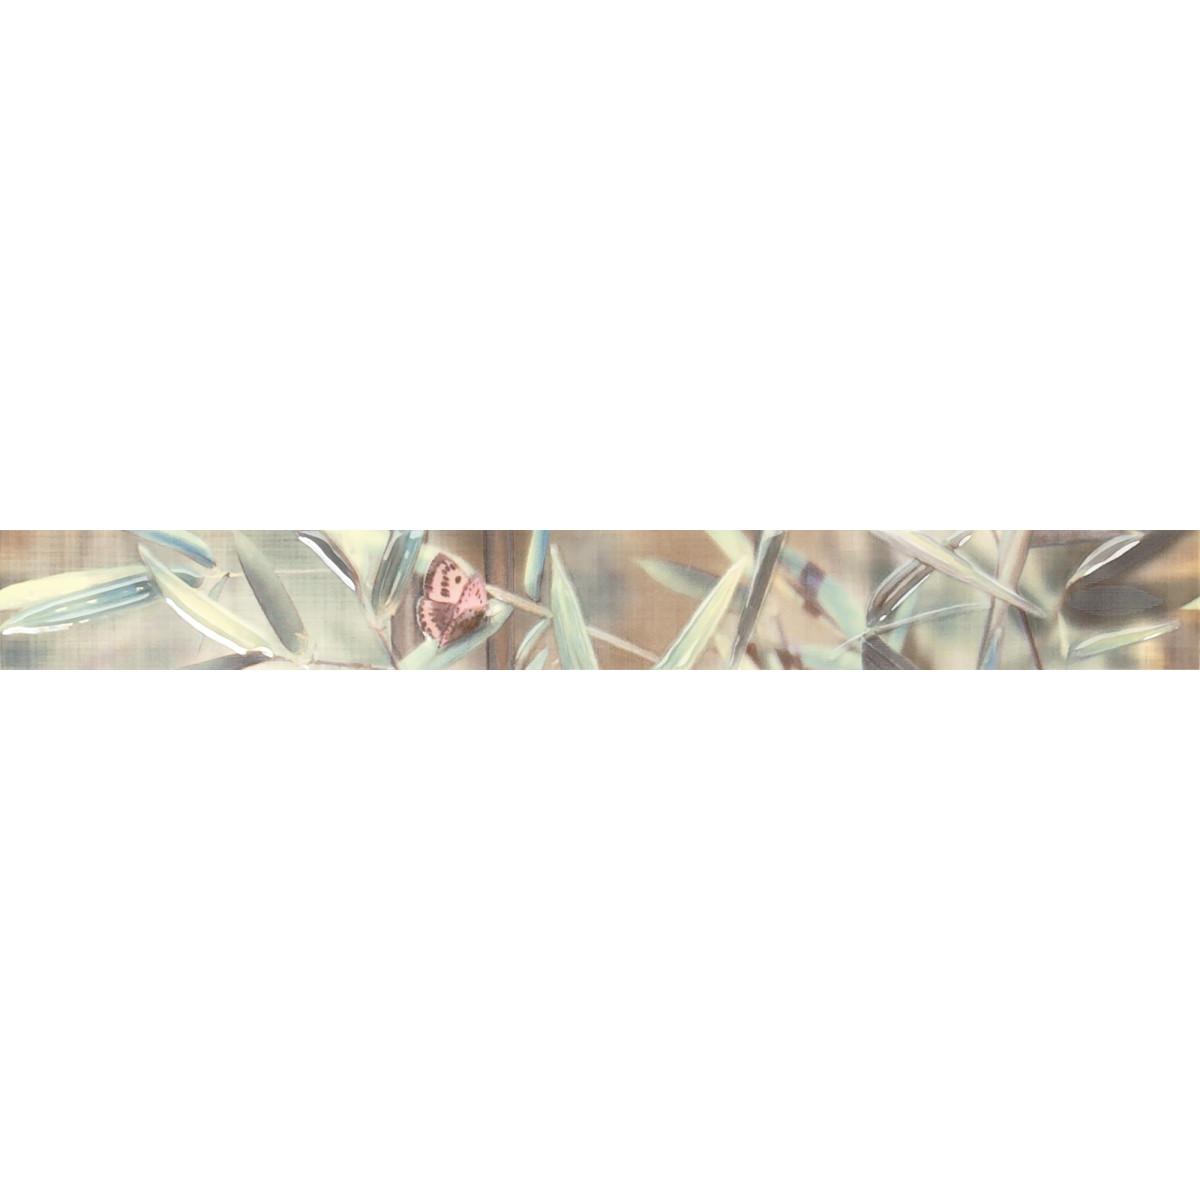 Бордюр «Бамбу» 4.6х40 см цвет салатовый